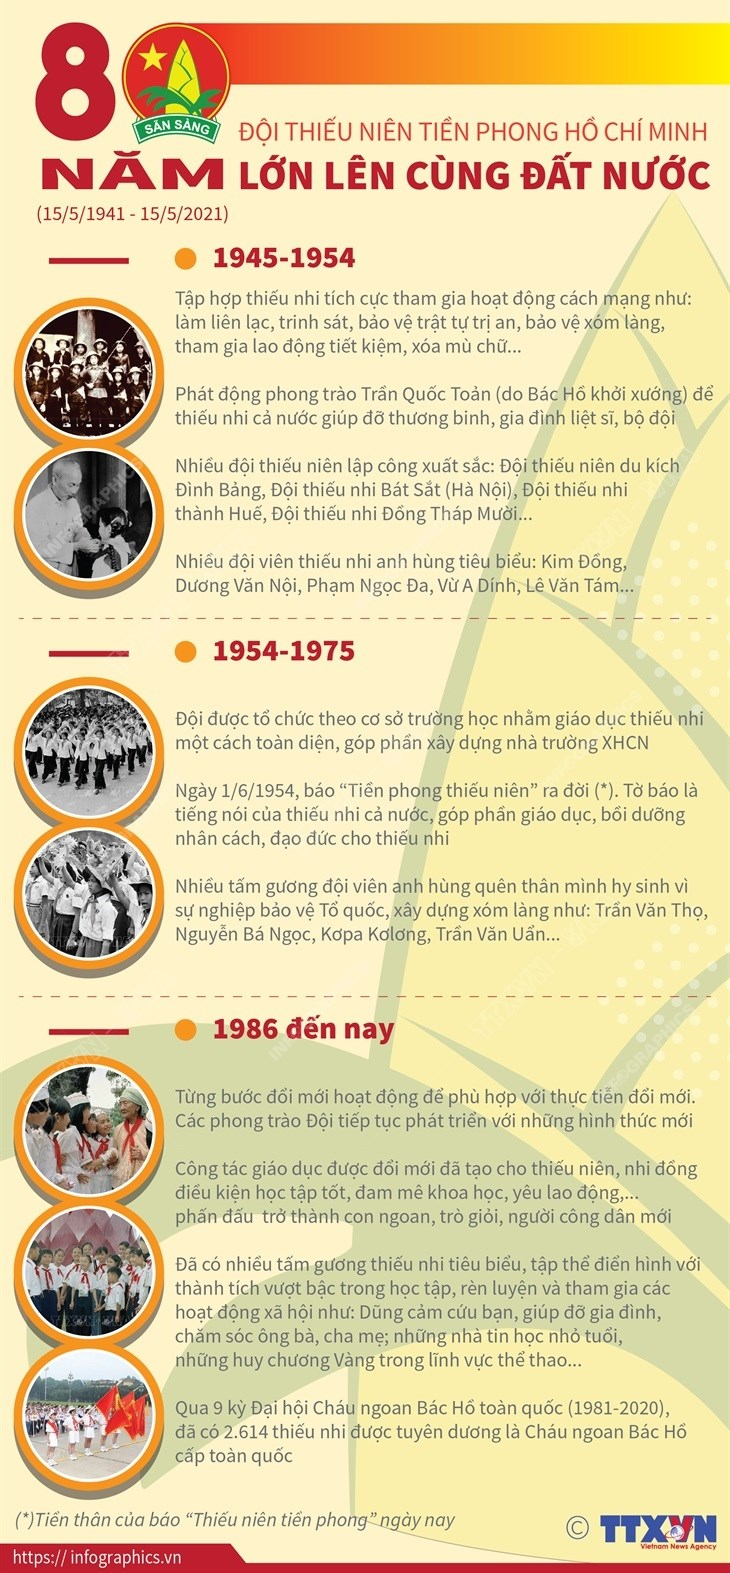 Doi Thieu nien tien phong Ho Chi Minh: 80 nam lon len cung dat nuoc hinh anh 1